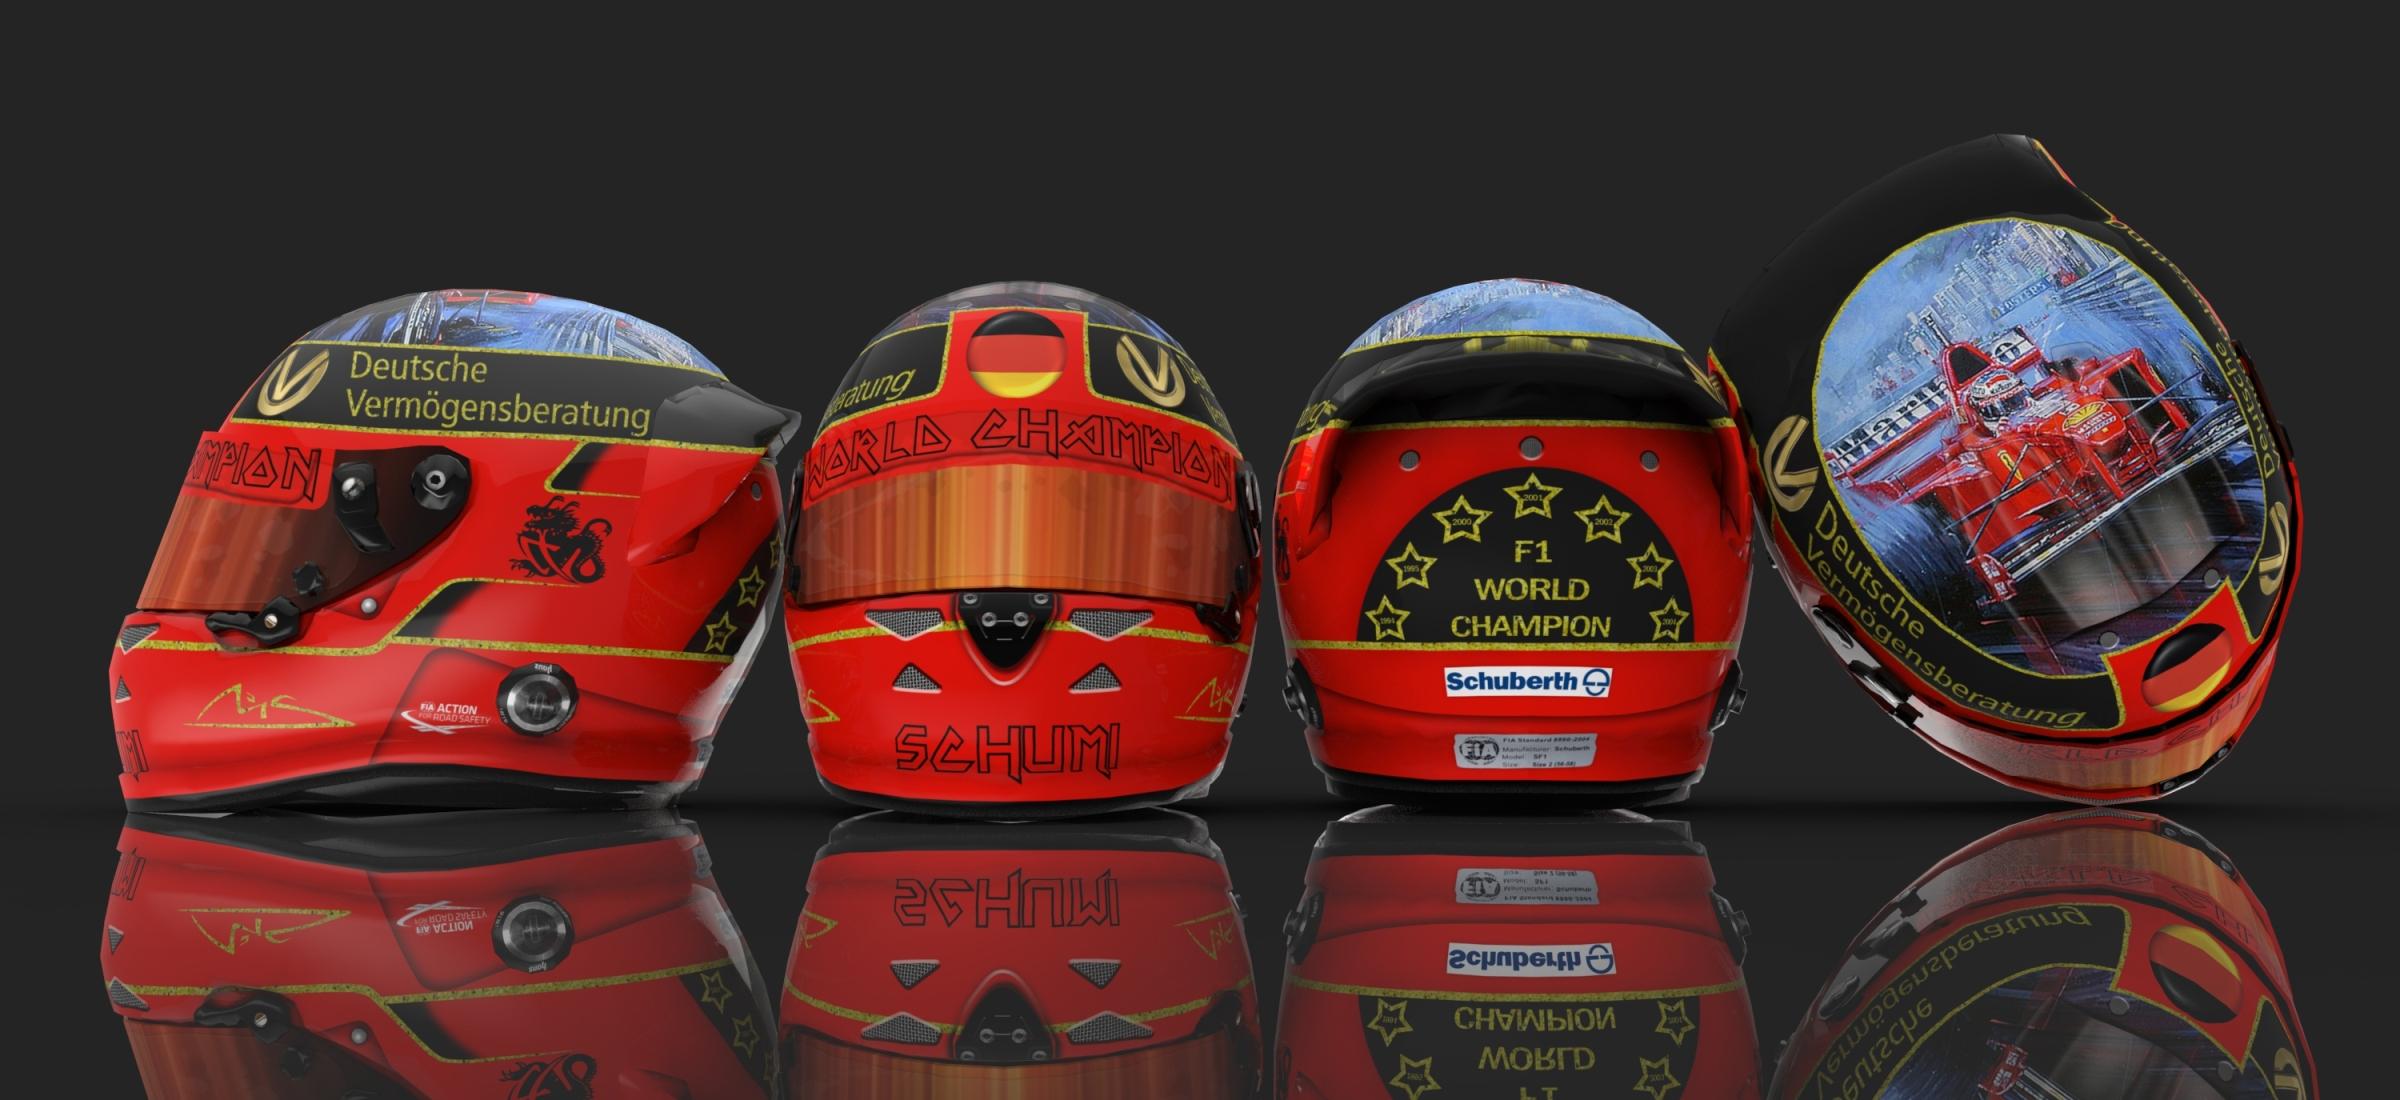 Schumacher Helmet.142.jpg